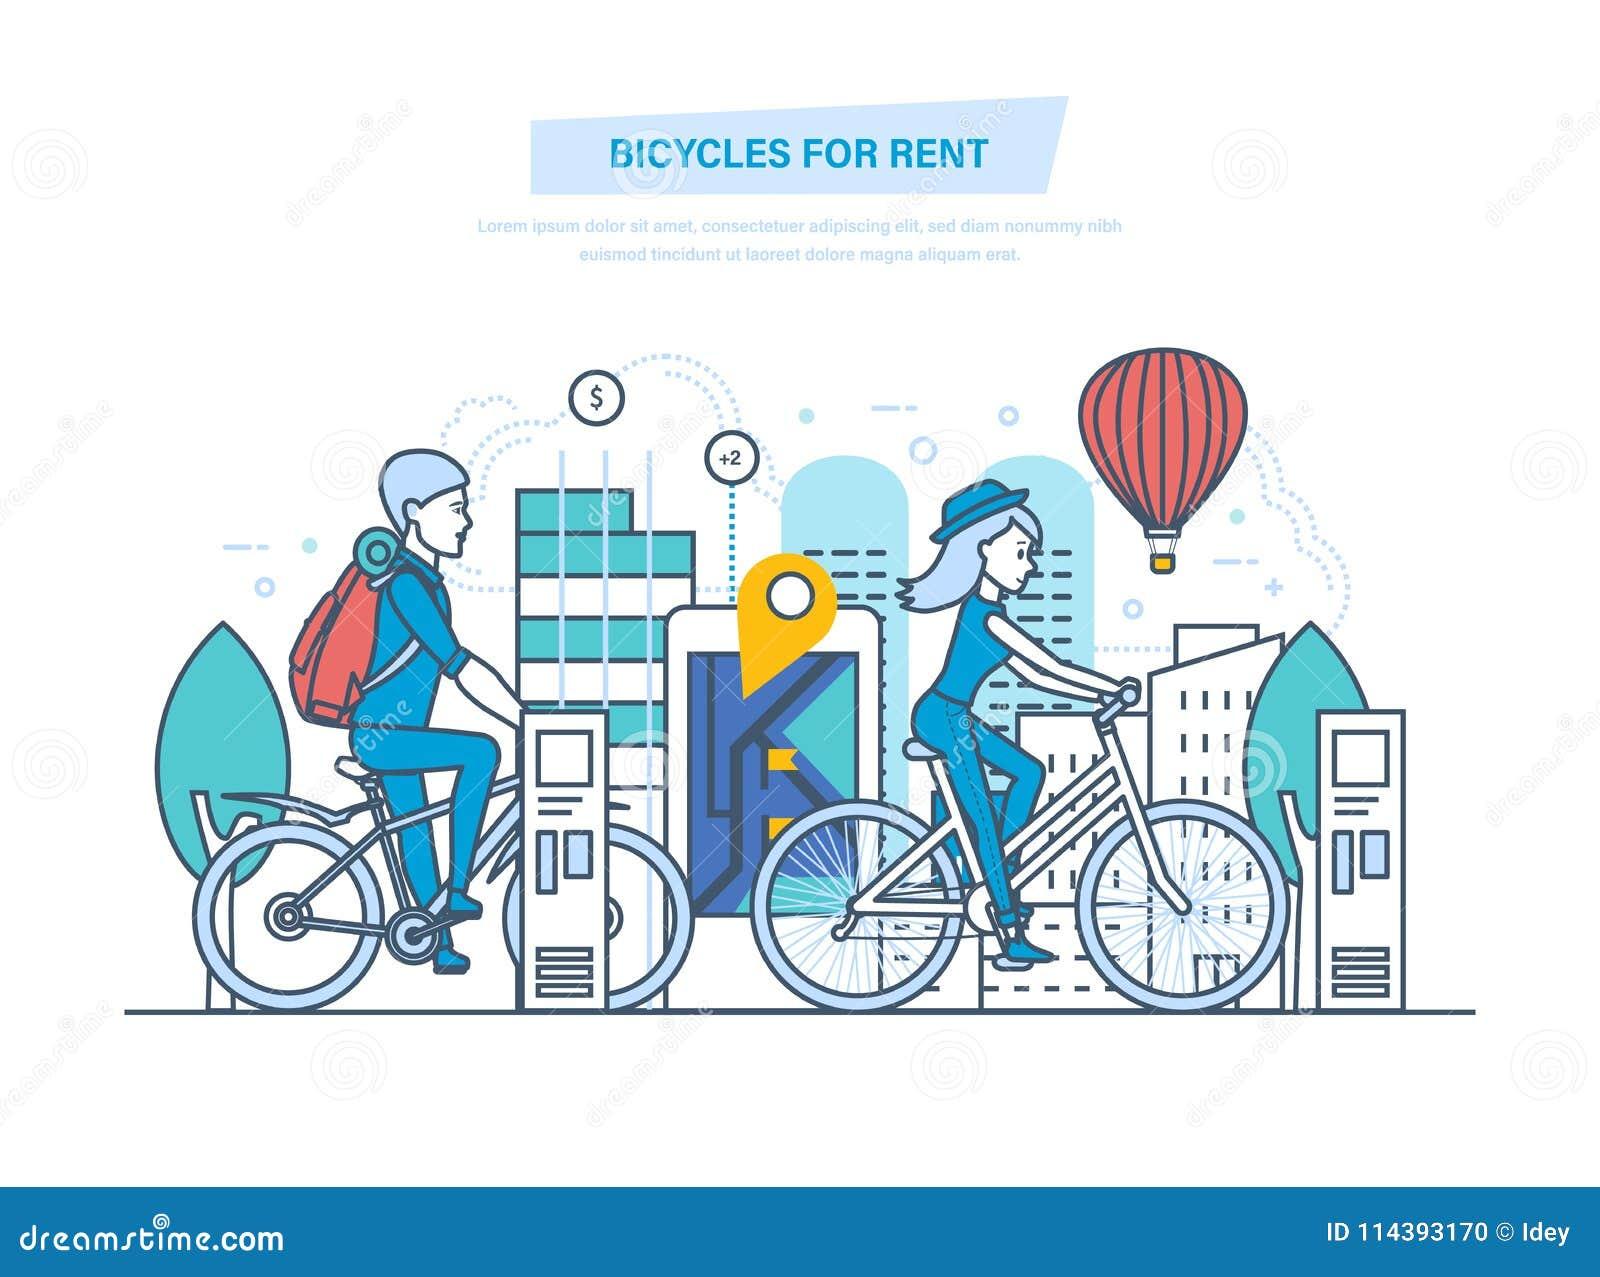 mobile bike rental business